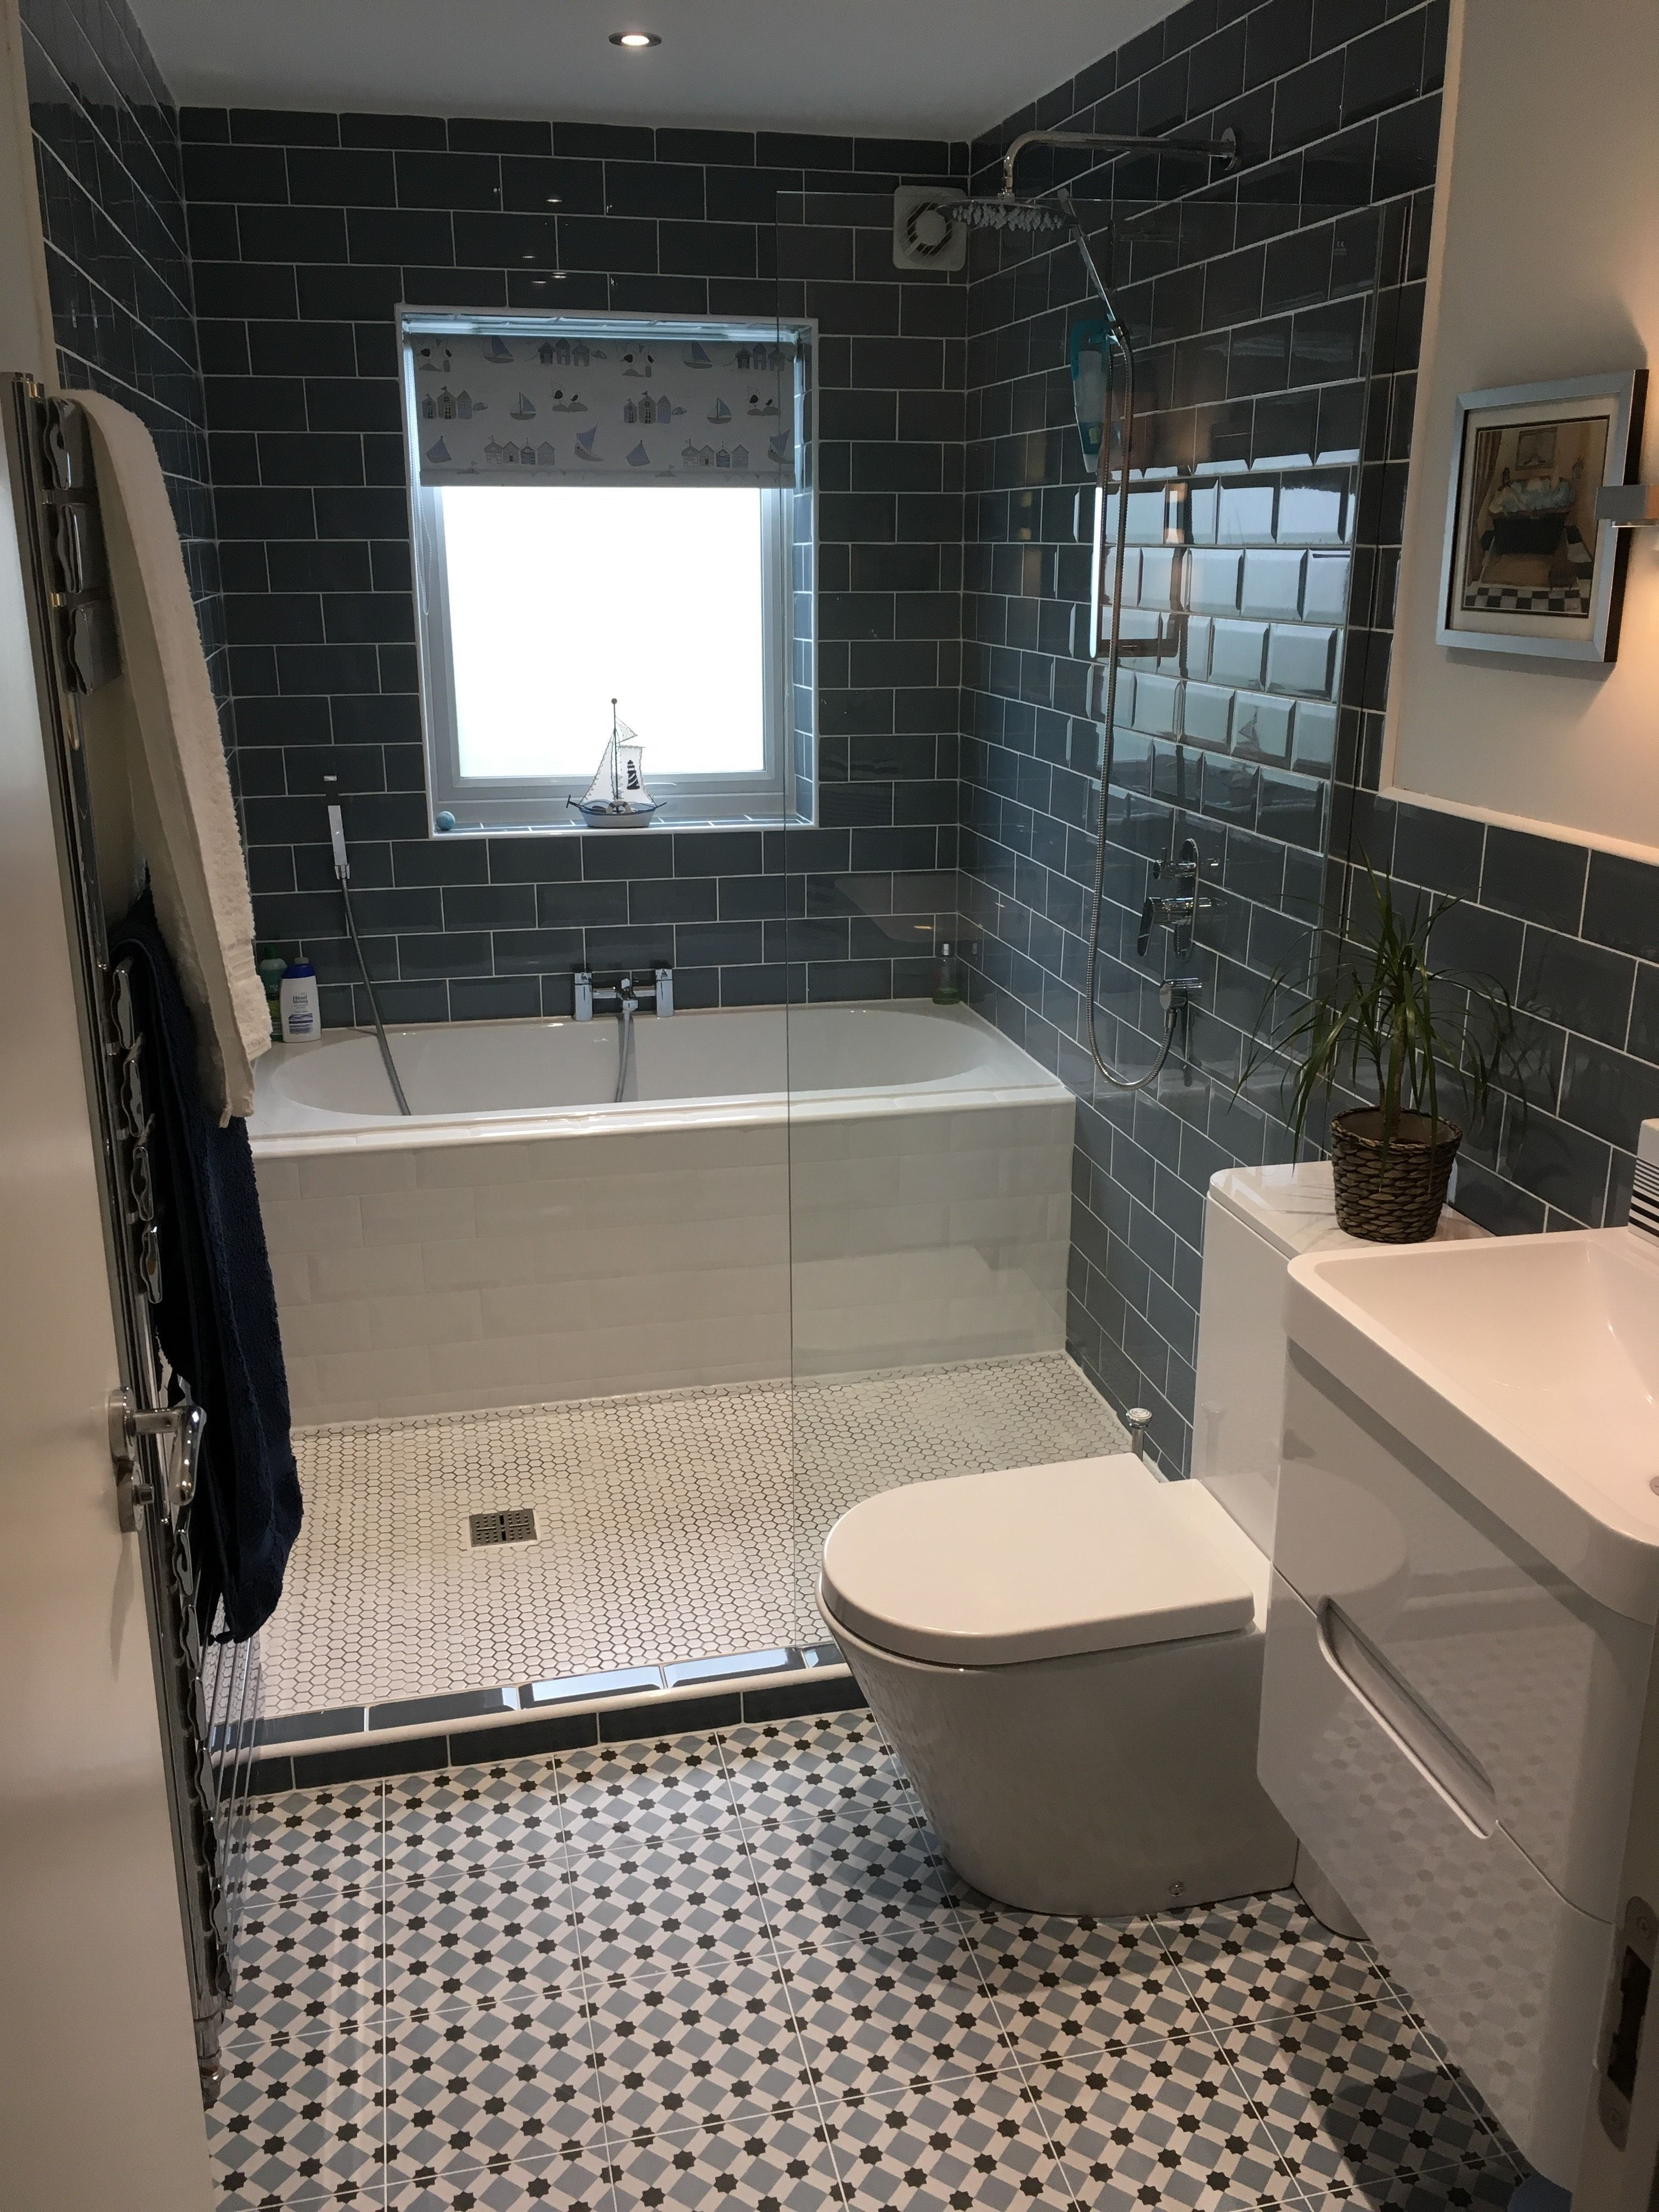 Innovative Modern Bathroom Design With Images Small Bathroom